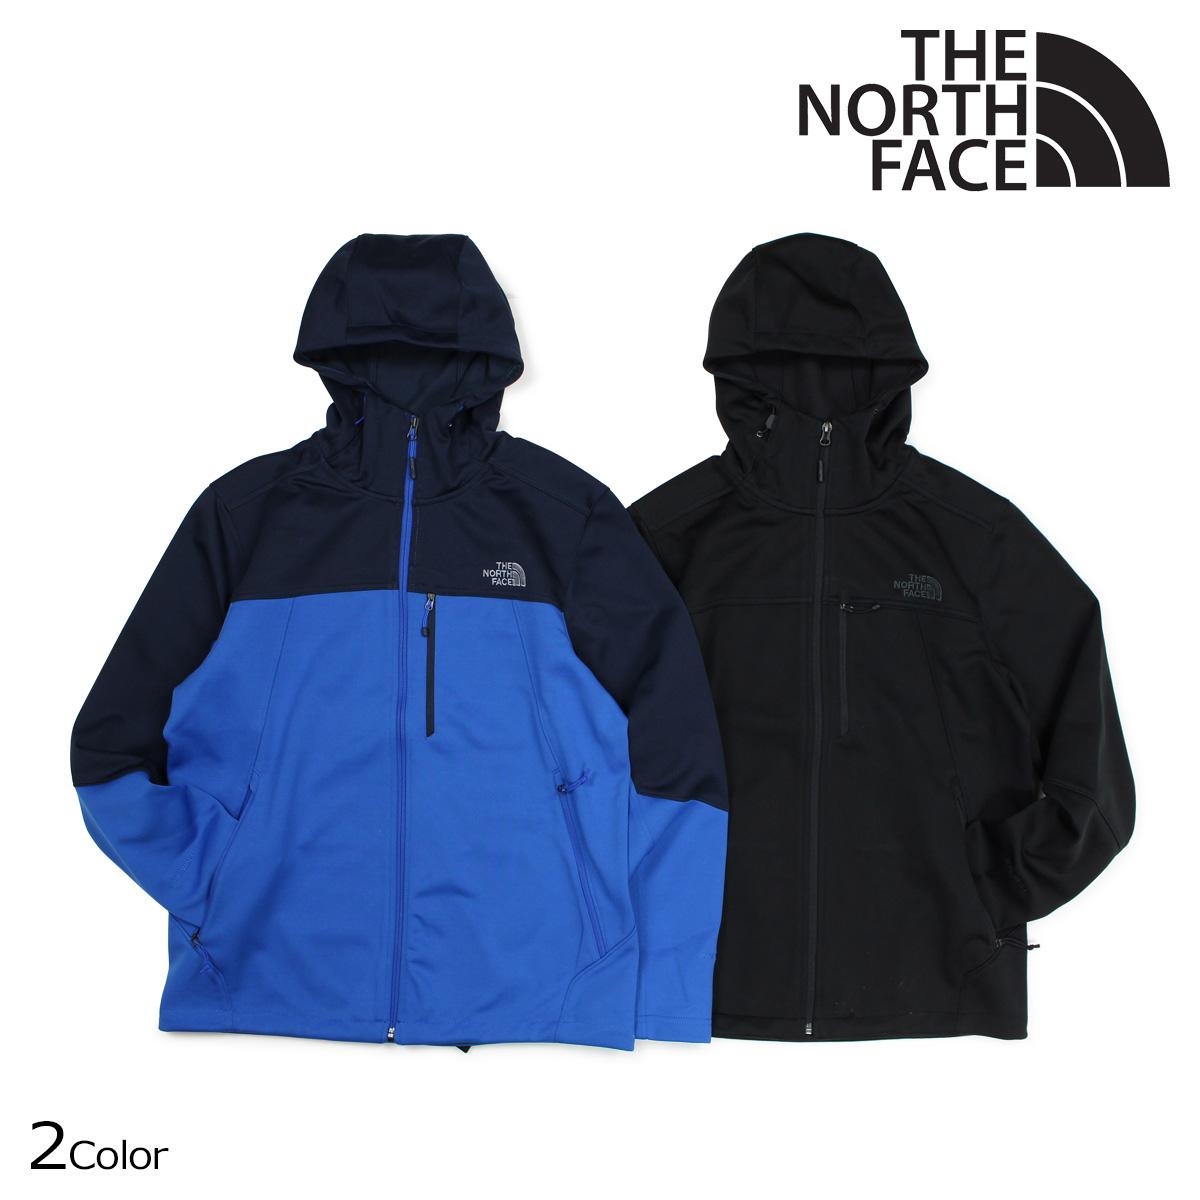 THE NORTH FACE ノースフェイス ジャケット マウンテンパーカー メンズ MENS APEX CANYONWALL HYBRID HOODIE ブラック ブルー NF0A3C6V